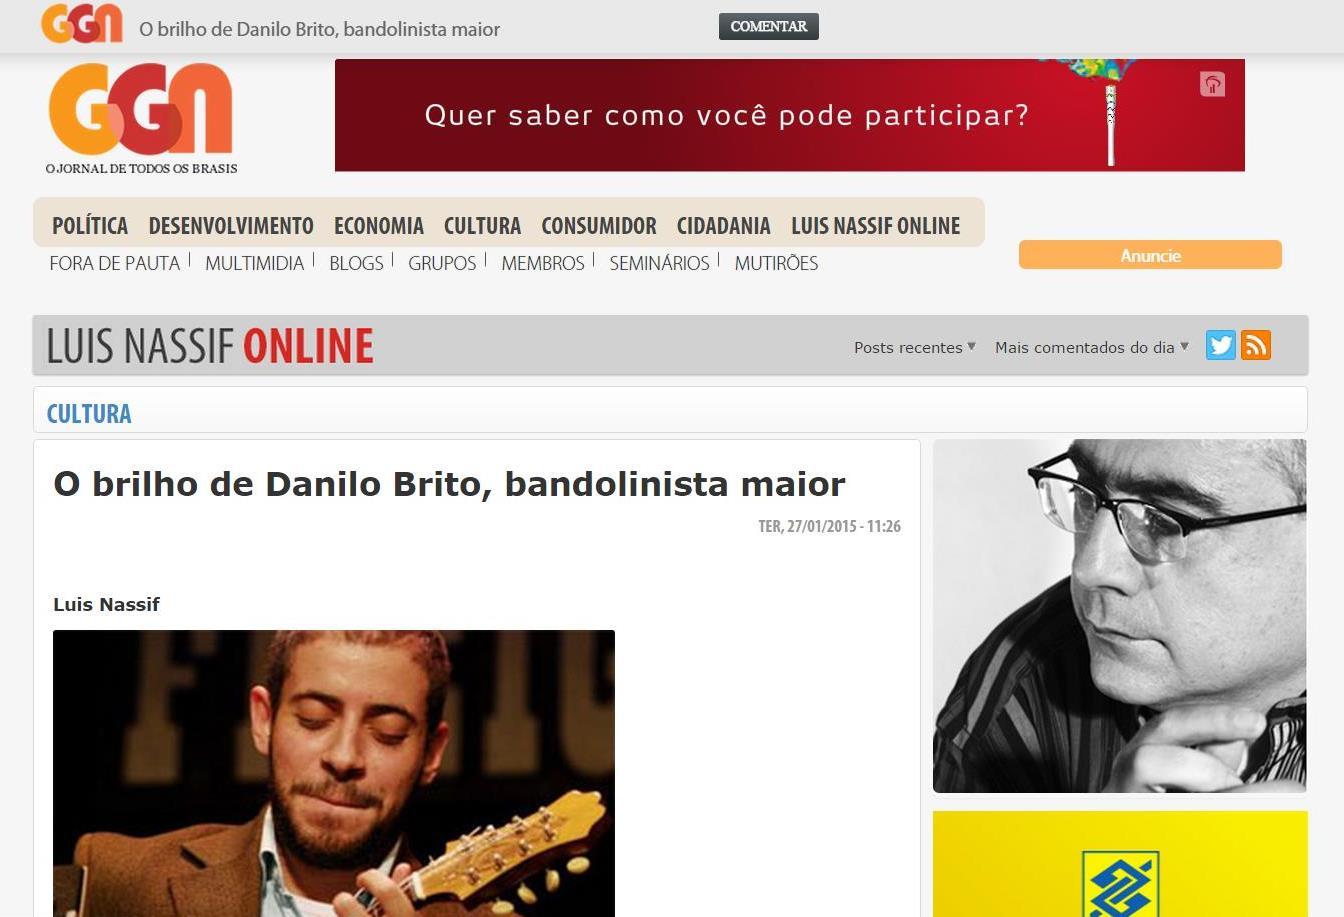 O brilho de Danilo Brito, bandolinista maior - Jornal GGN